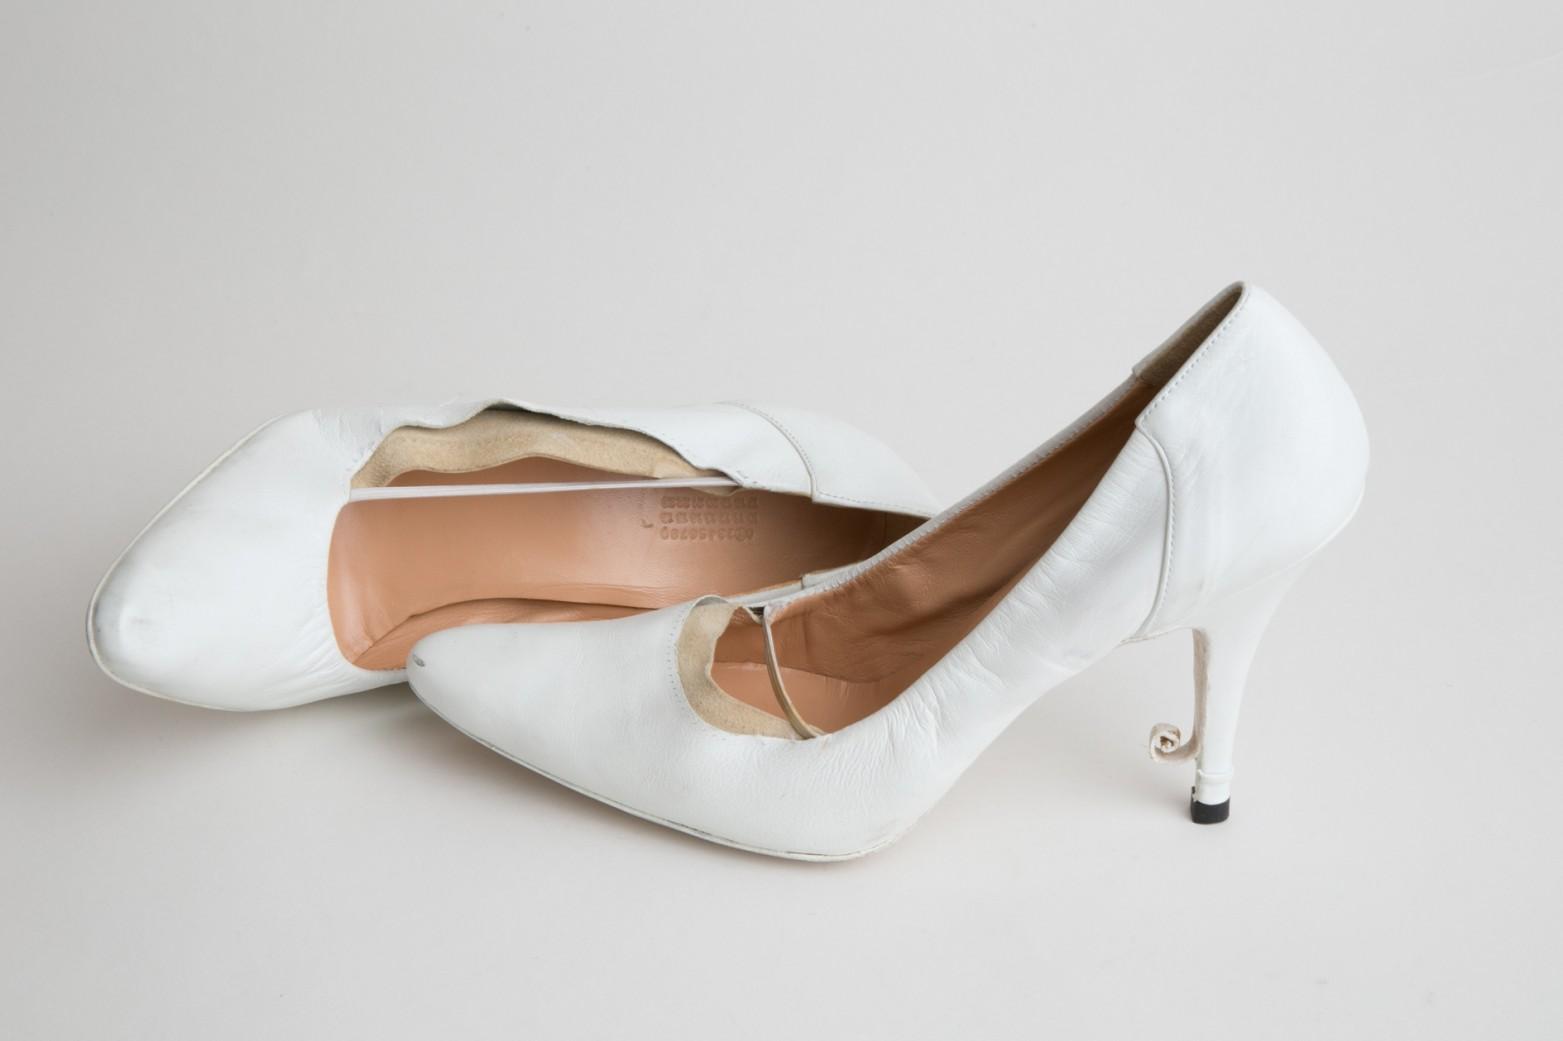 Maison Martin Margiela Deconstructed Shoes